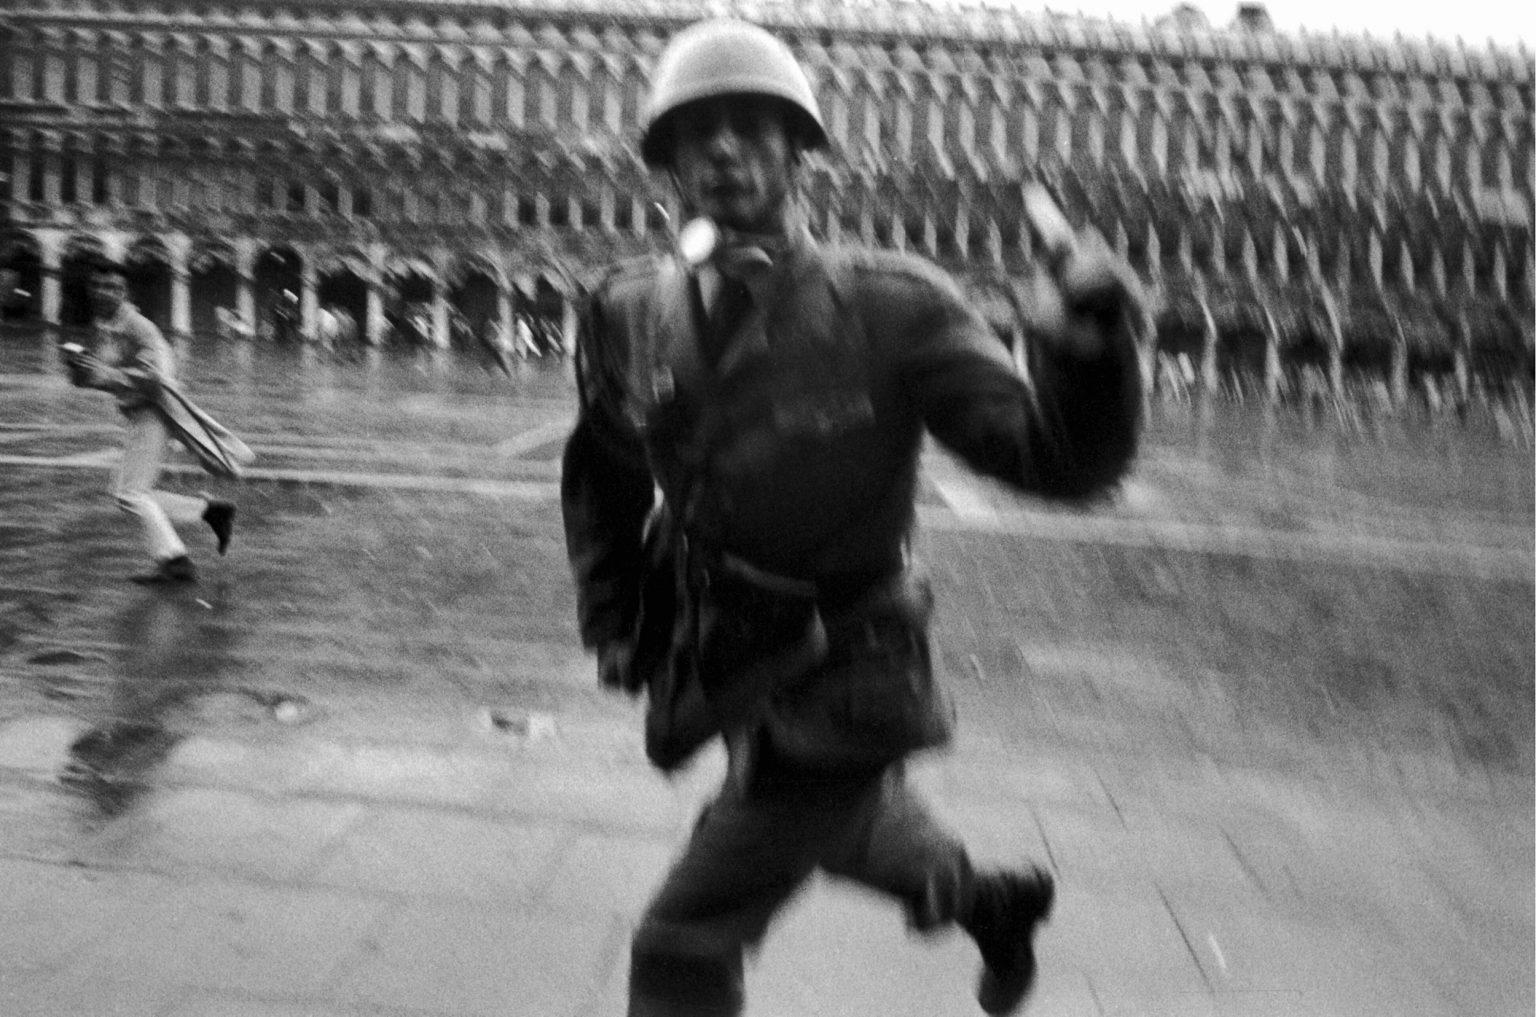 "VENICE 1969 - PROTESTS AT THE BIENNAL - VENEZIA 1969 - LA CONTESTAZIONE DELLA BIENNALE   34 Biennale d'Arte - The 34th Venice Contemporary Art Biennial <p><span style=""color: #ff0000""><strong>*** SPECIAL   FEE   APPLIES ***</strong></span></p> *** Local Caption *** 00104203"